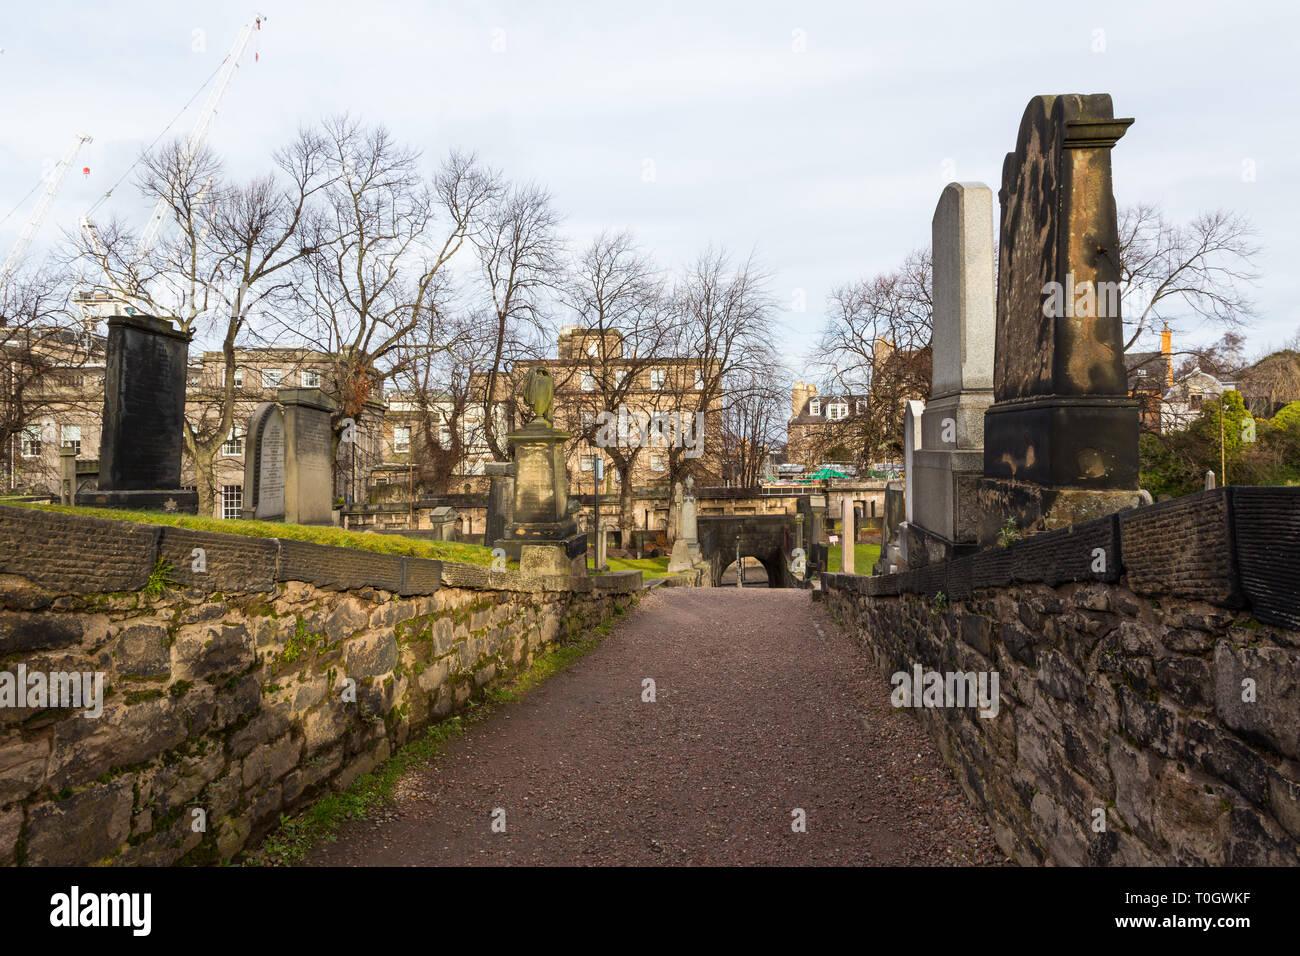 Edimburgh (Scotland) - The Old Calton Burial Ground, graveyard at Calton Hill Stock Photo